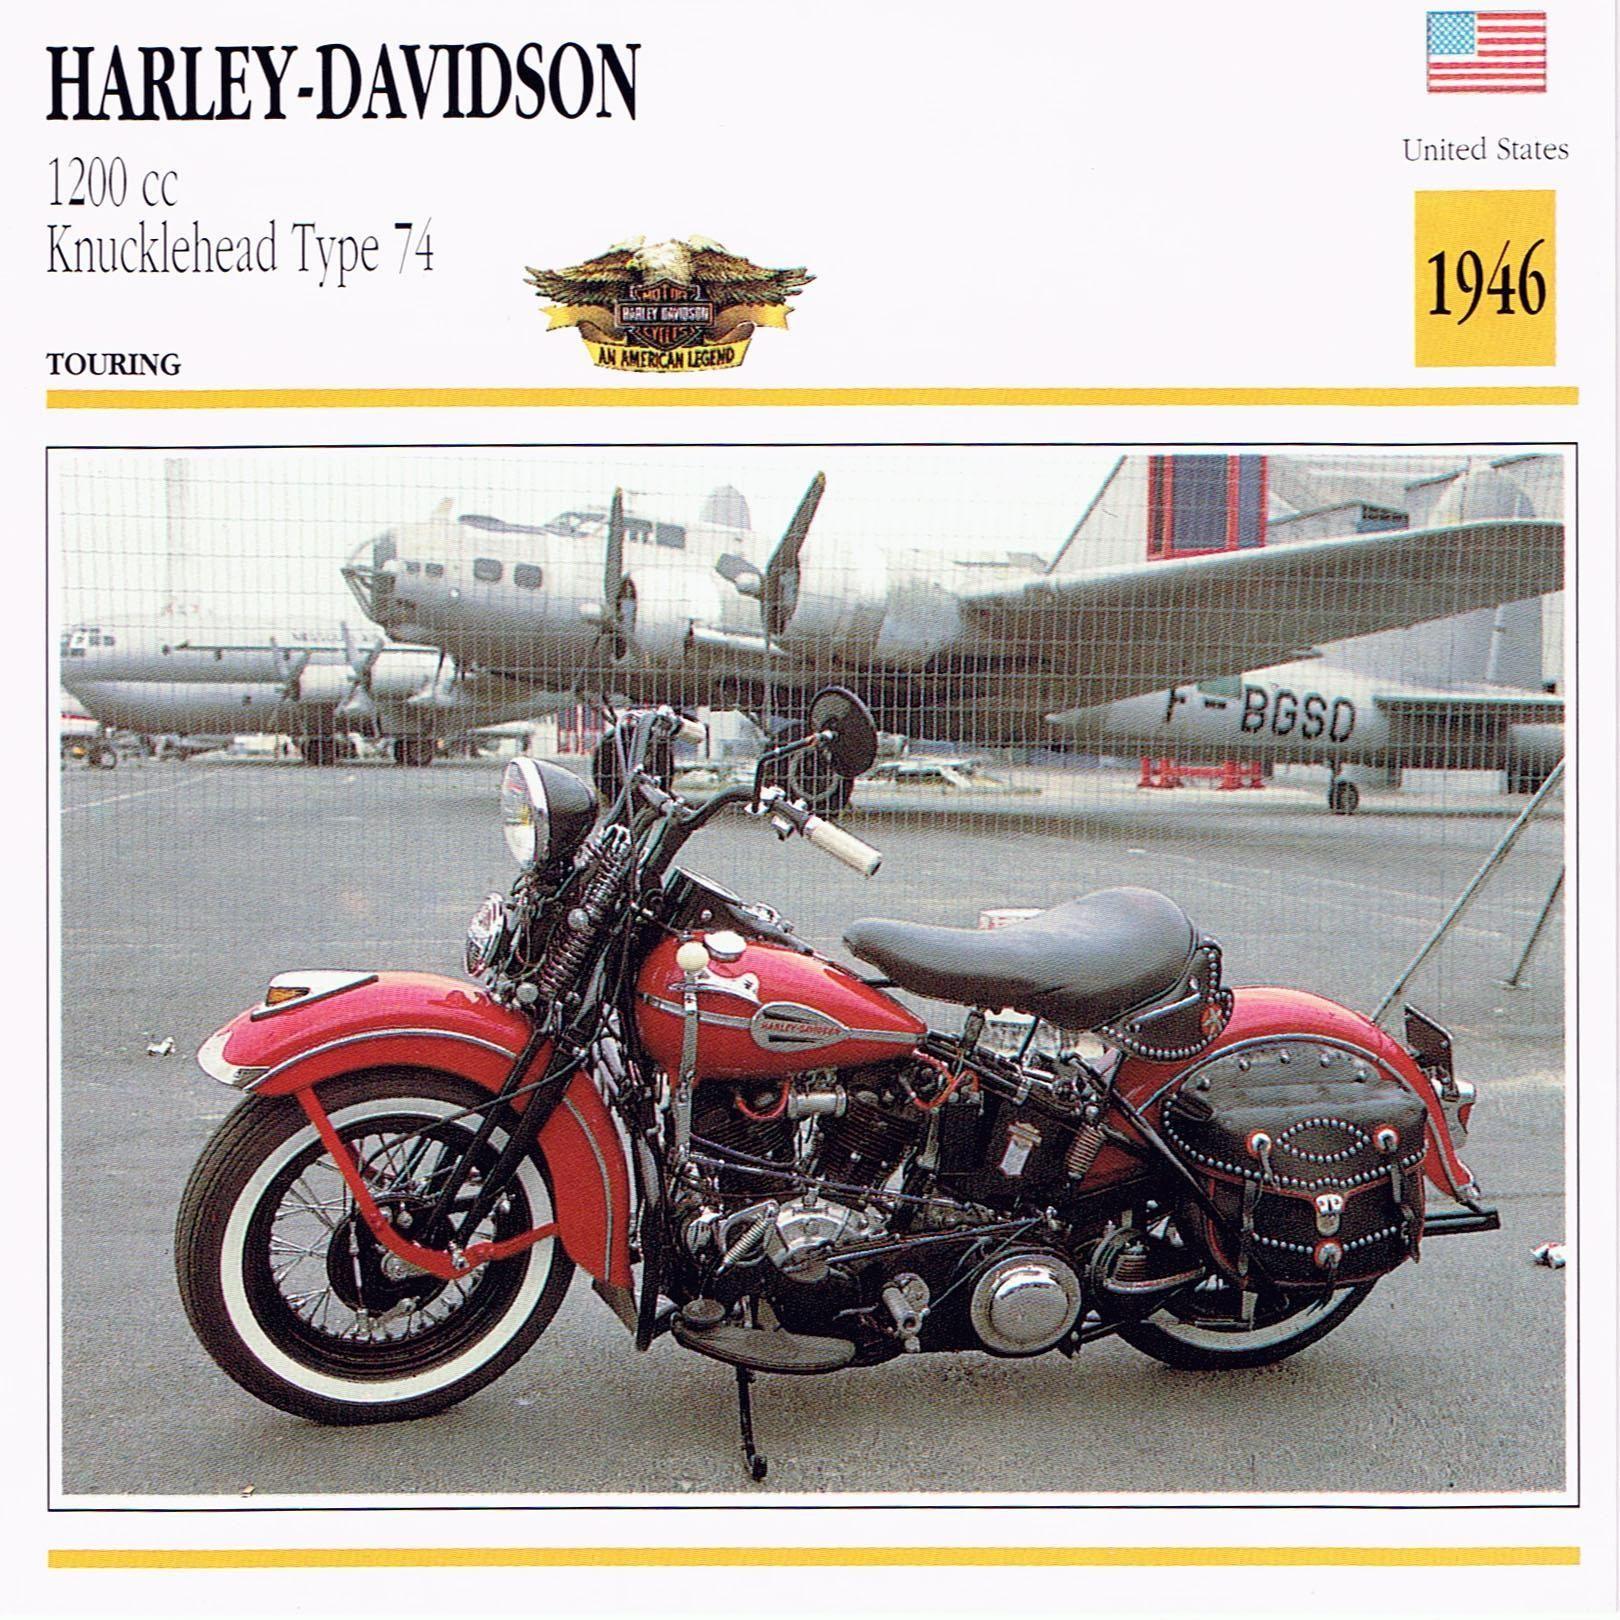 HARLEY DAVIDSON FL 1200 Type 74 Knucklehead Specs